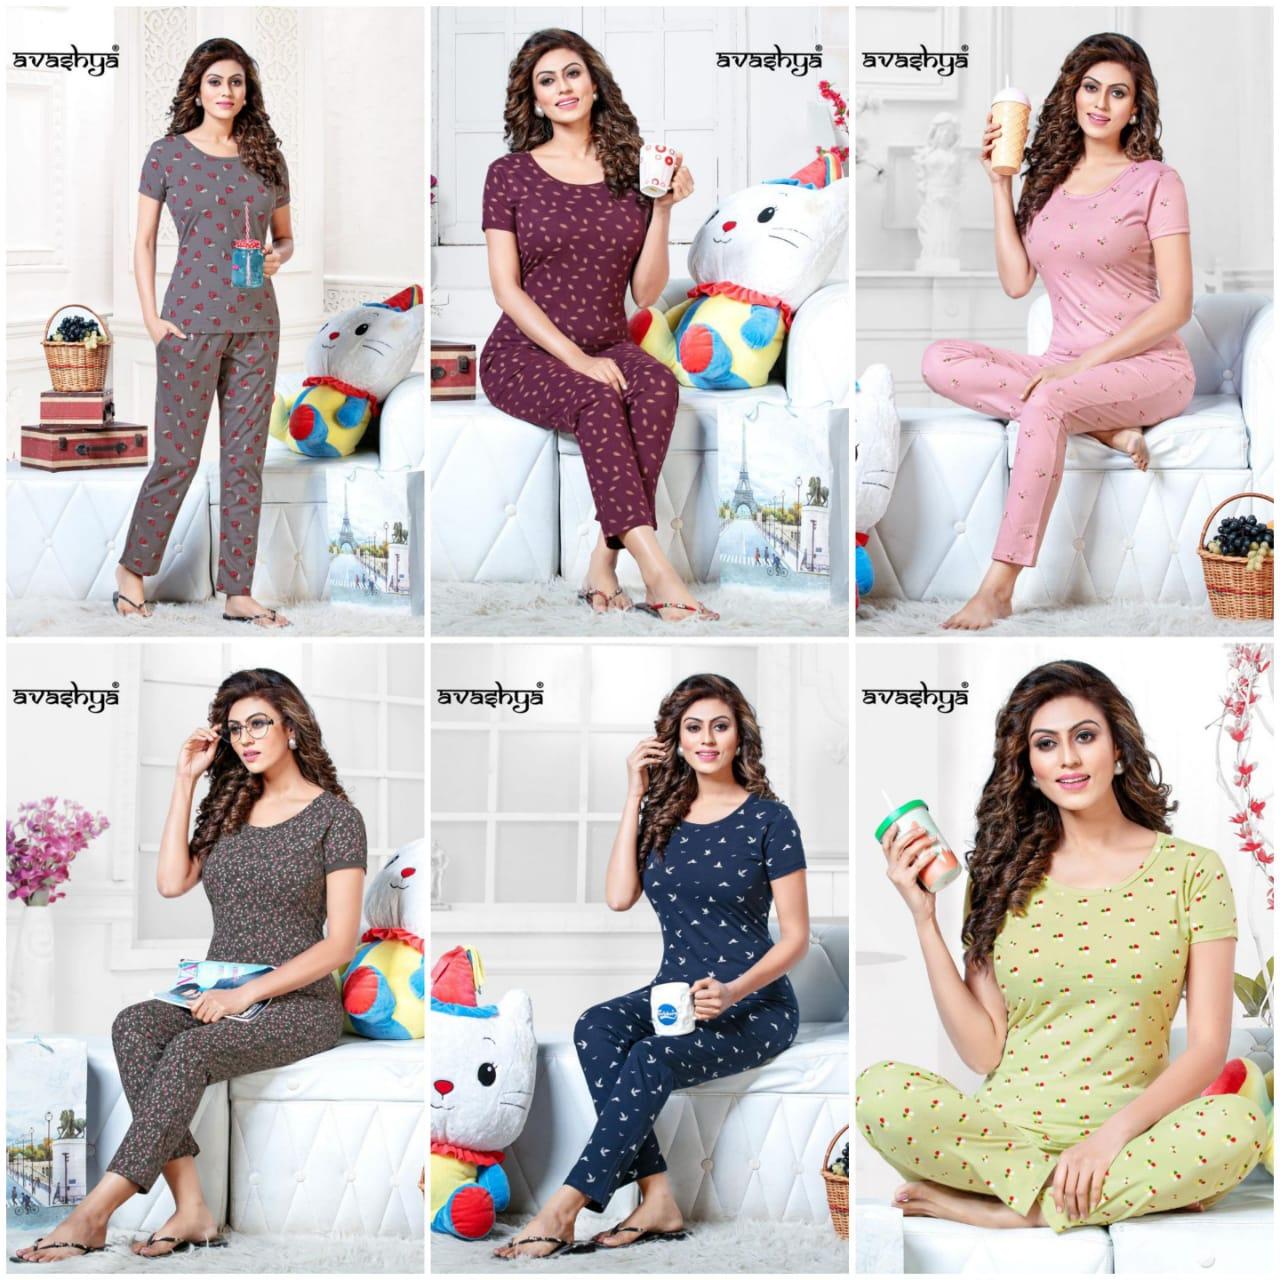 Avashya Premium Night Wear Vol 2 Wholesale Catalog 6 Pcs 7 - Avashya Premium Night Wear Vol 2 Wholesale Catalog 6 Pcs